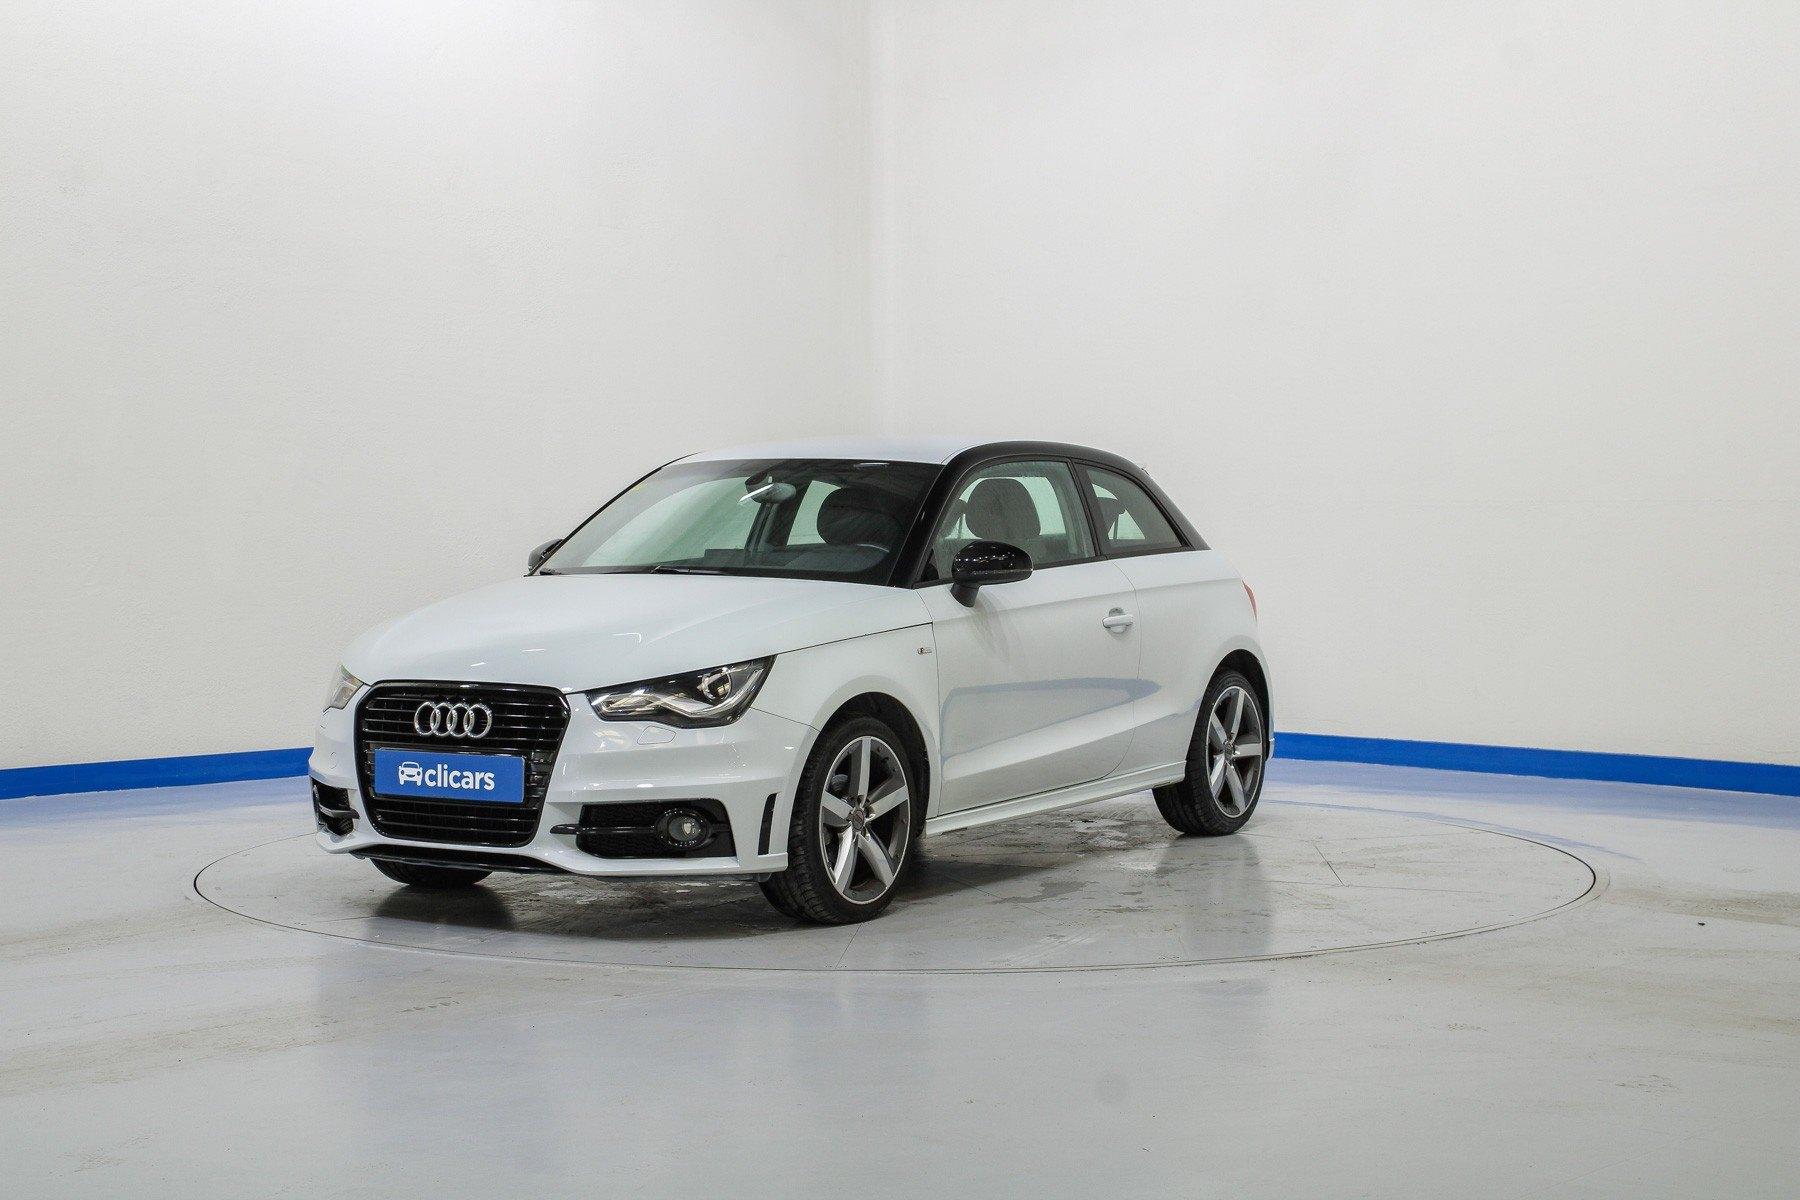 Audi A1 Gasolina 1.2 TFSI 86cv Adrenalin 1